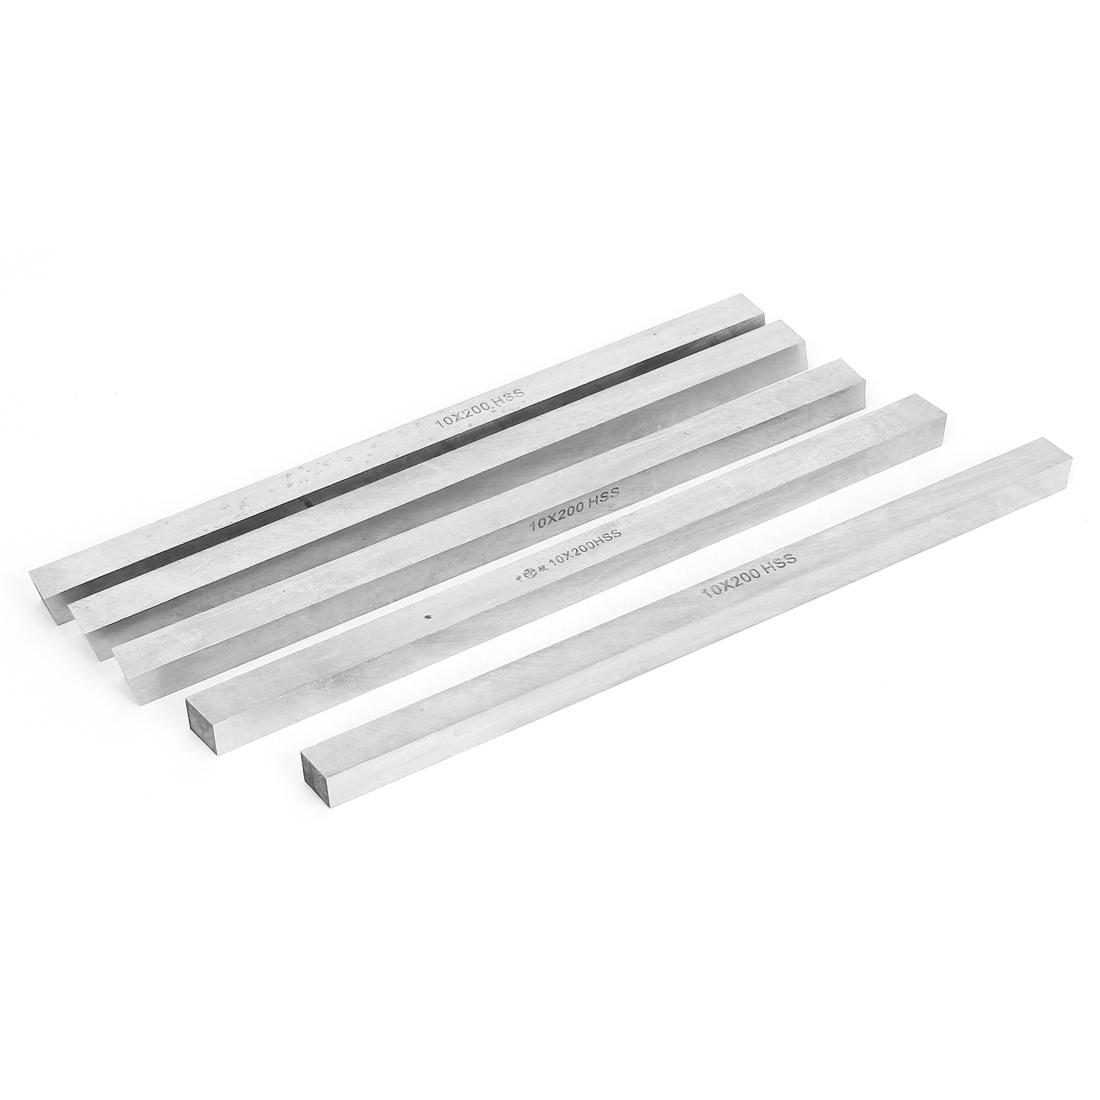 5pcs 10mmx10mmx200mm HSS Cutter Tool Bit CNC Lathe Milling Turning Boring Bar